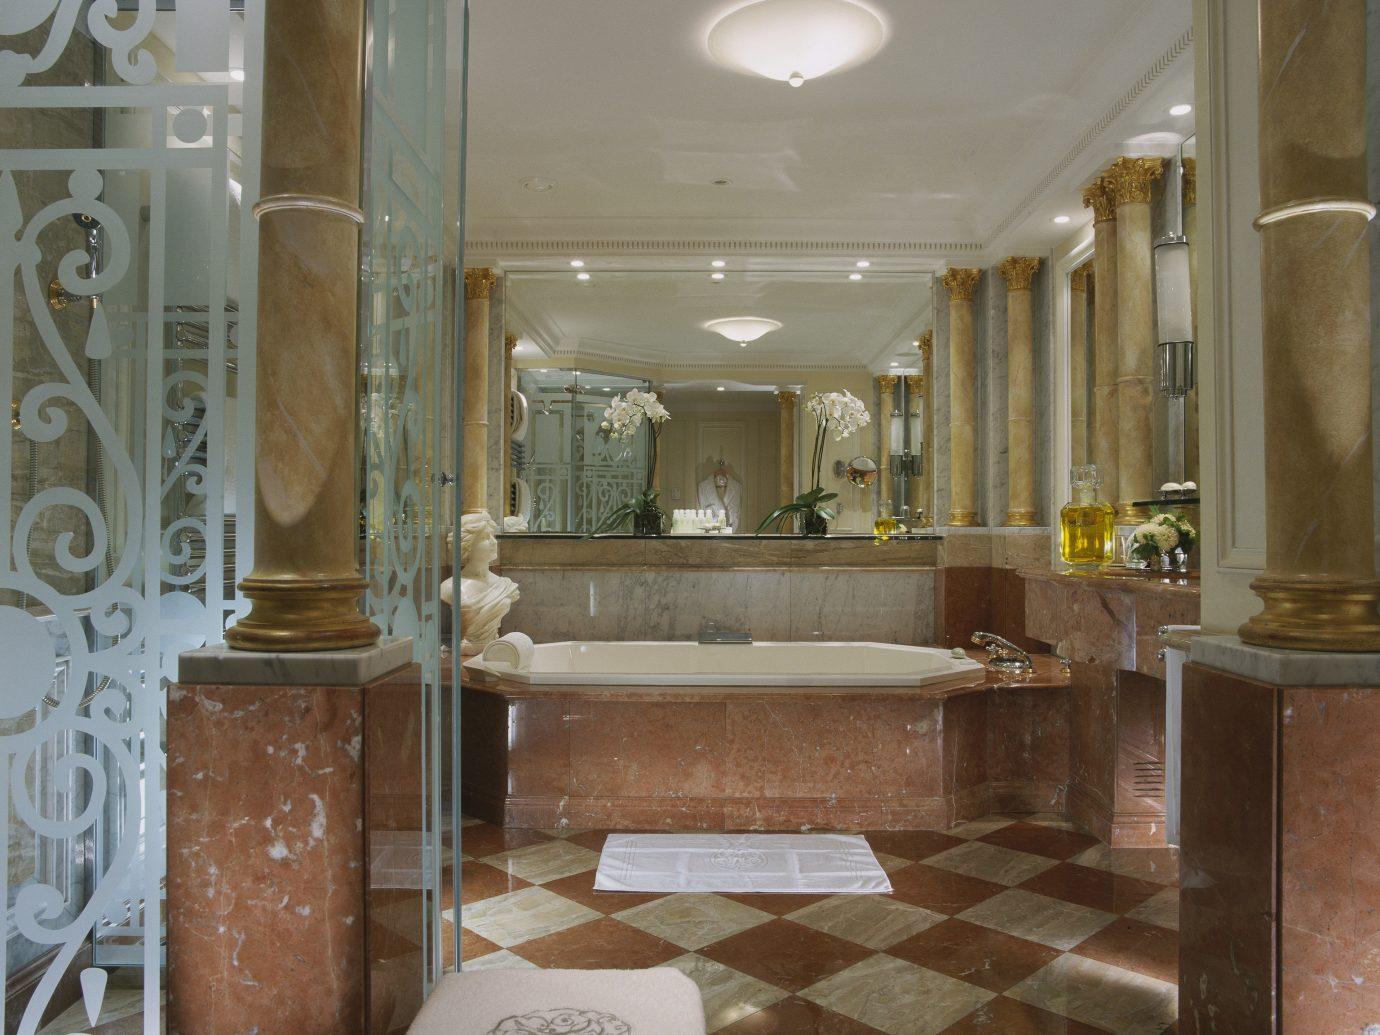 Hotels Luxury Travel indoor room Lobby interior design ceiling estate real estate floor flooring